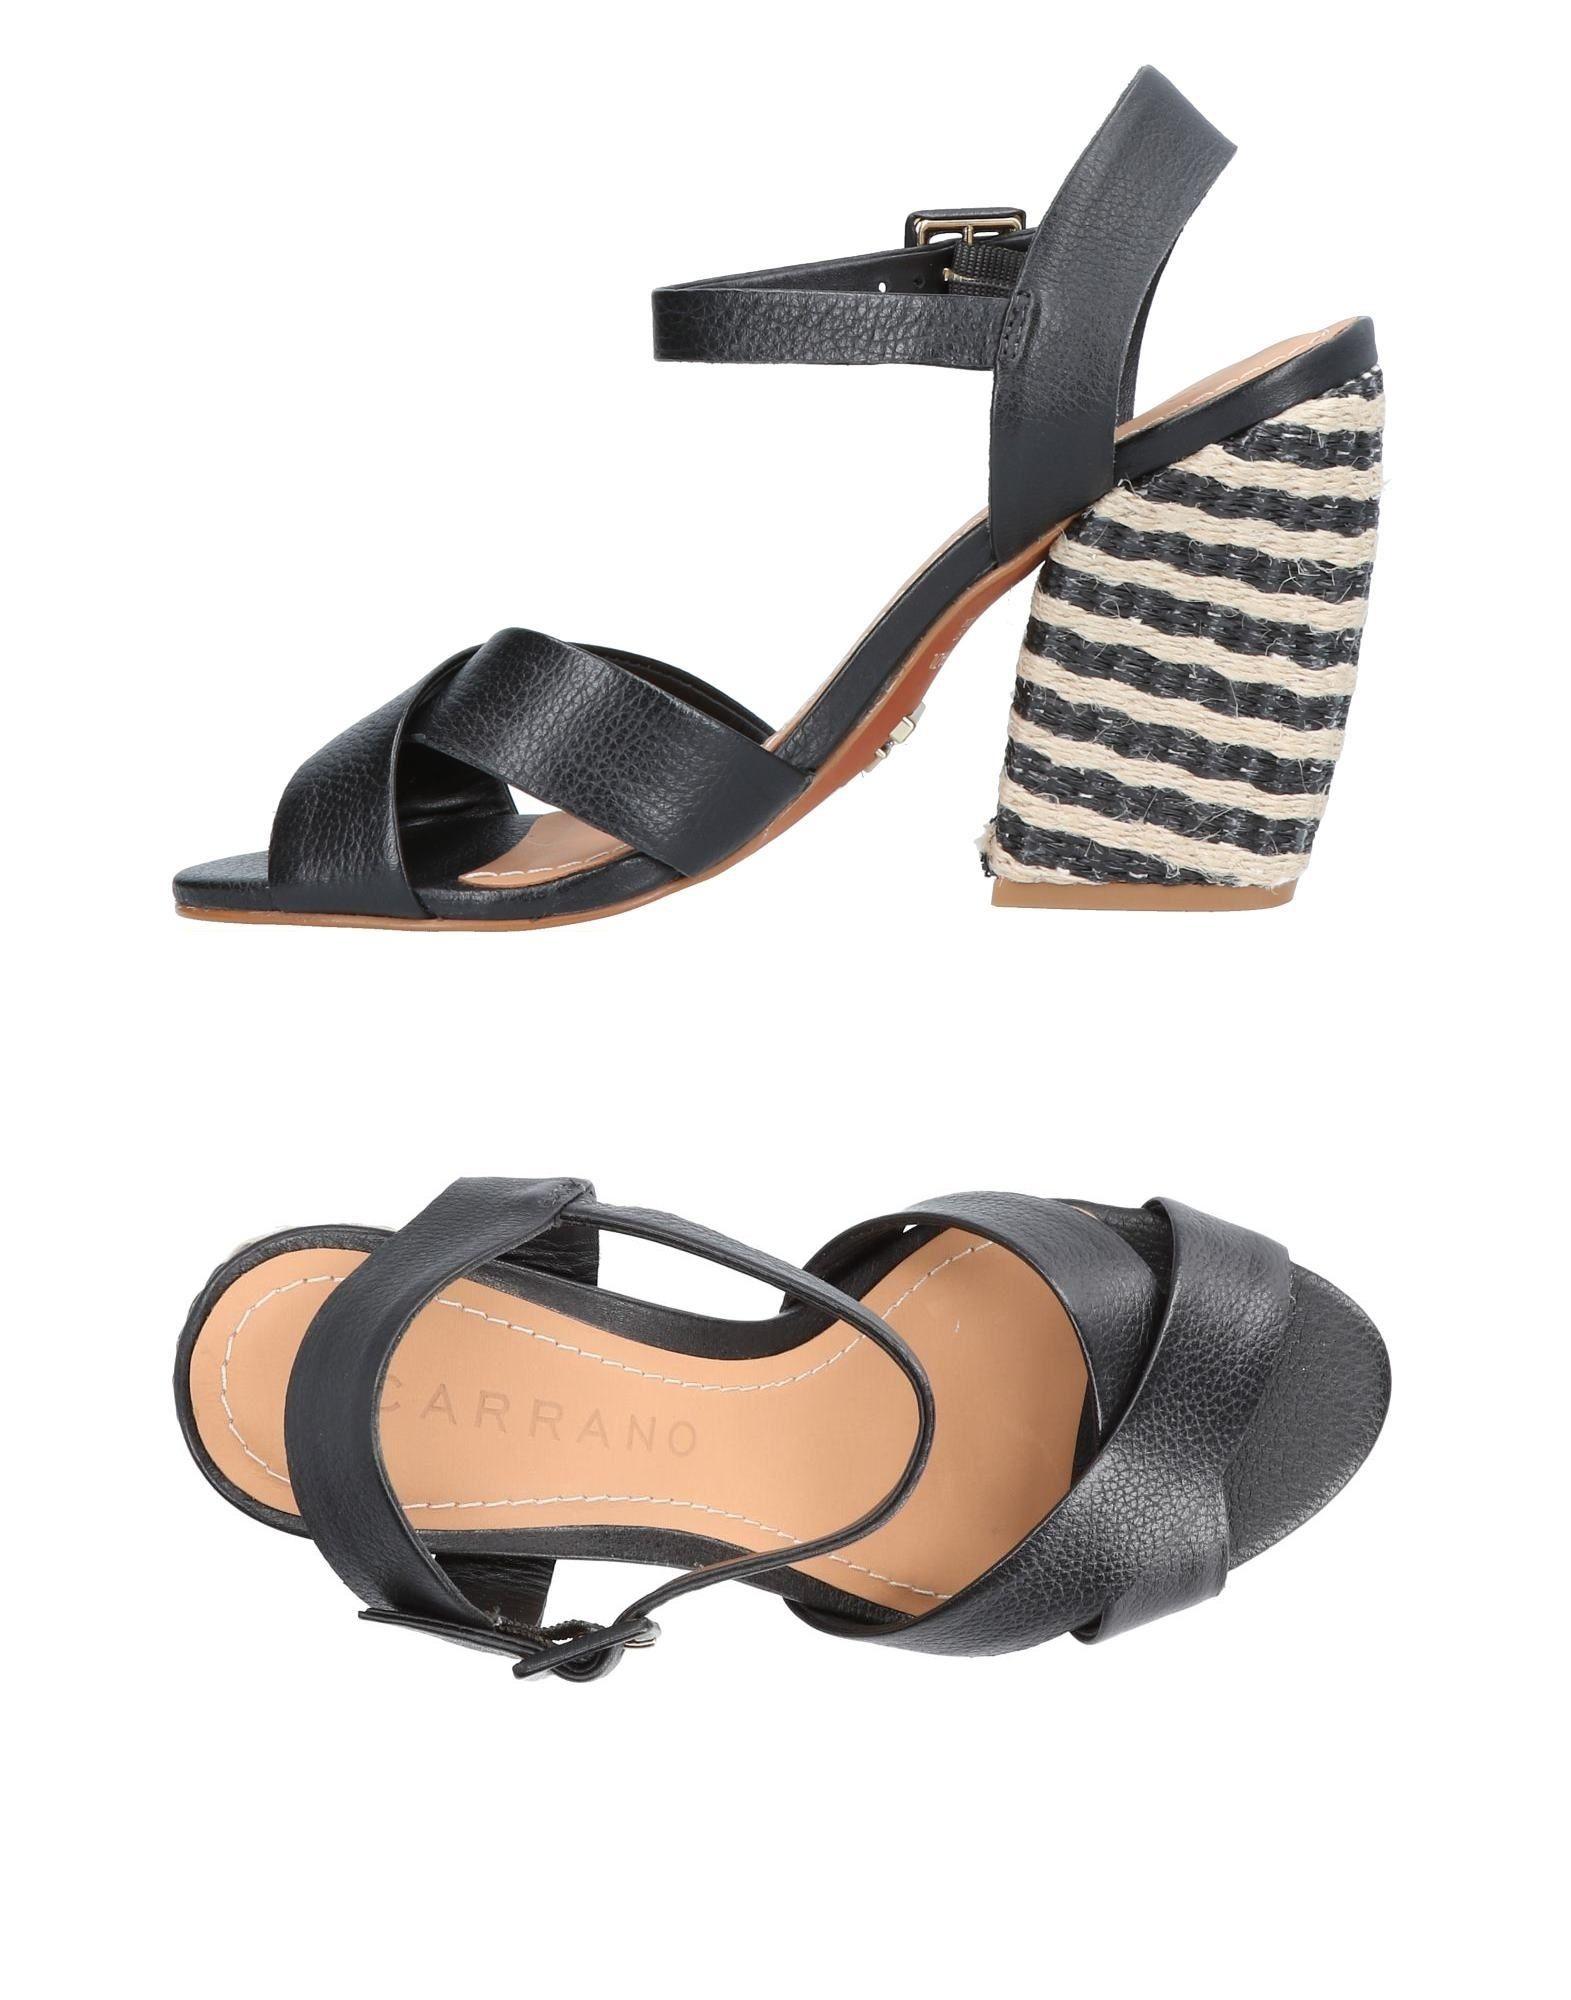 Moda Sandali Carrano Donna Donna Carrano - 11447340FE c1d71a